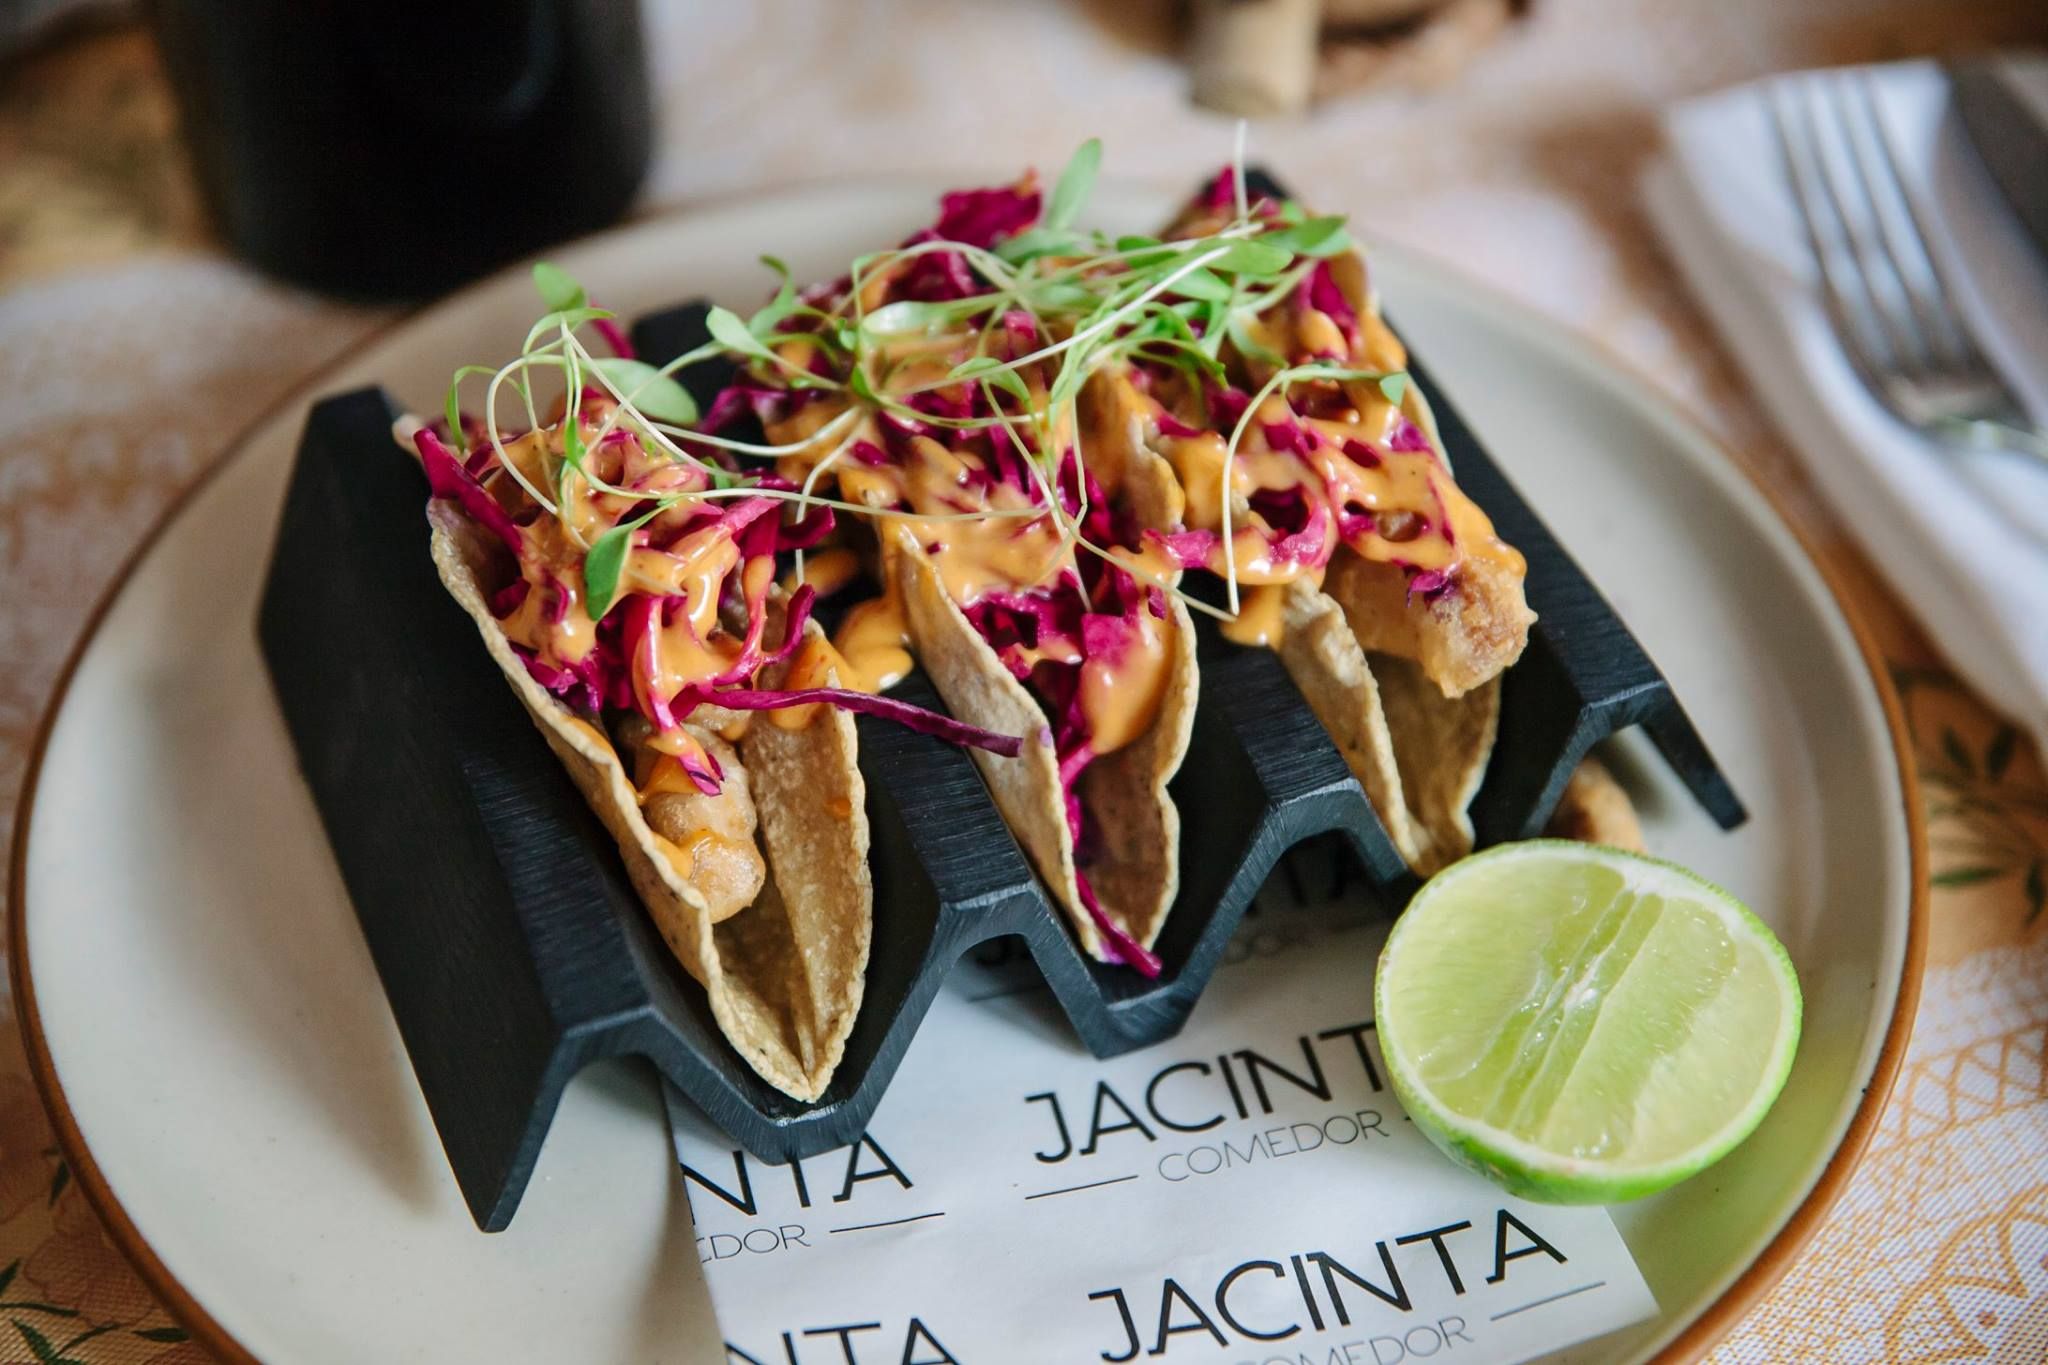 6 'spots' para saciar tu antojo de tacos estilo Ensenada en la CDMX